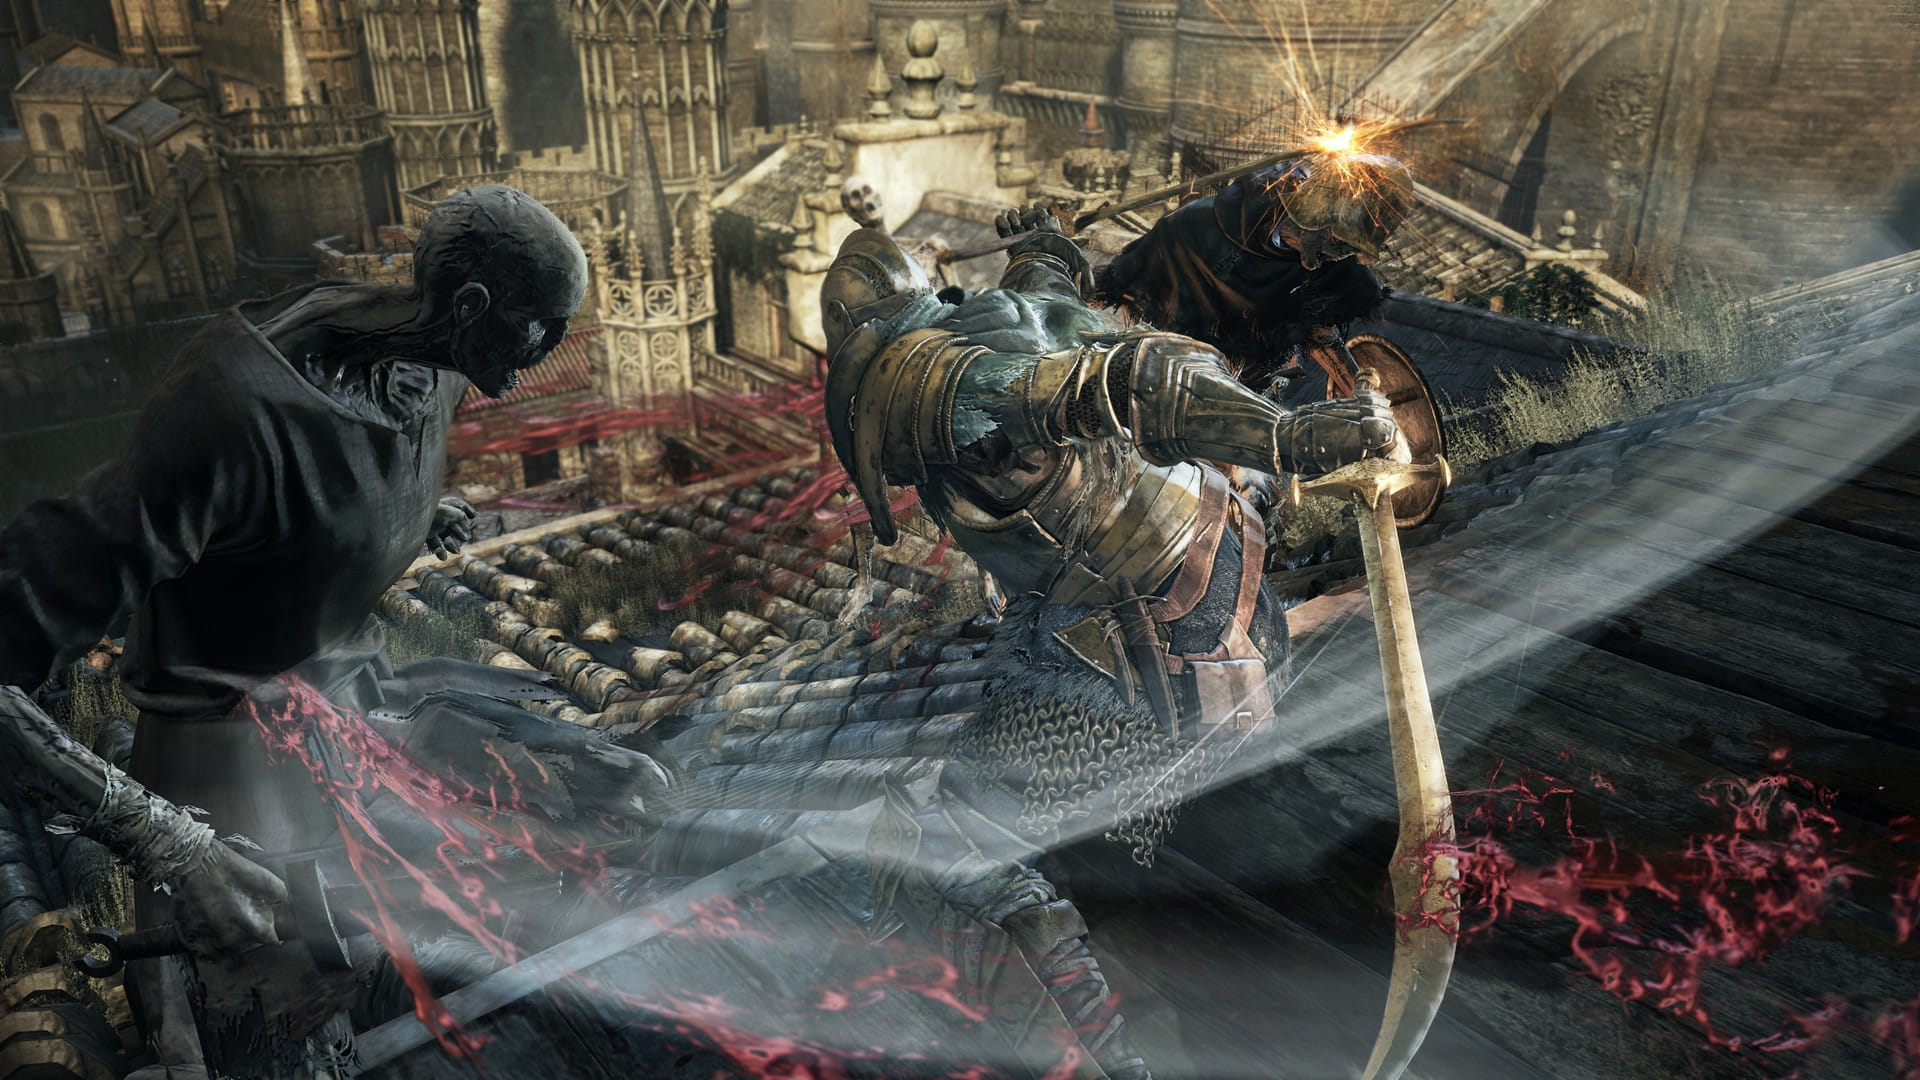 Dark Souls 3 The Fire Fades Edition | Dark Souls 3 Wiki